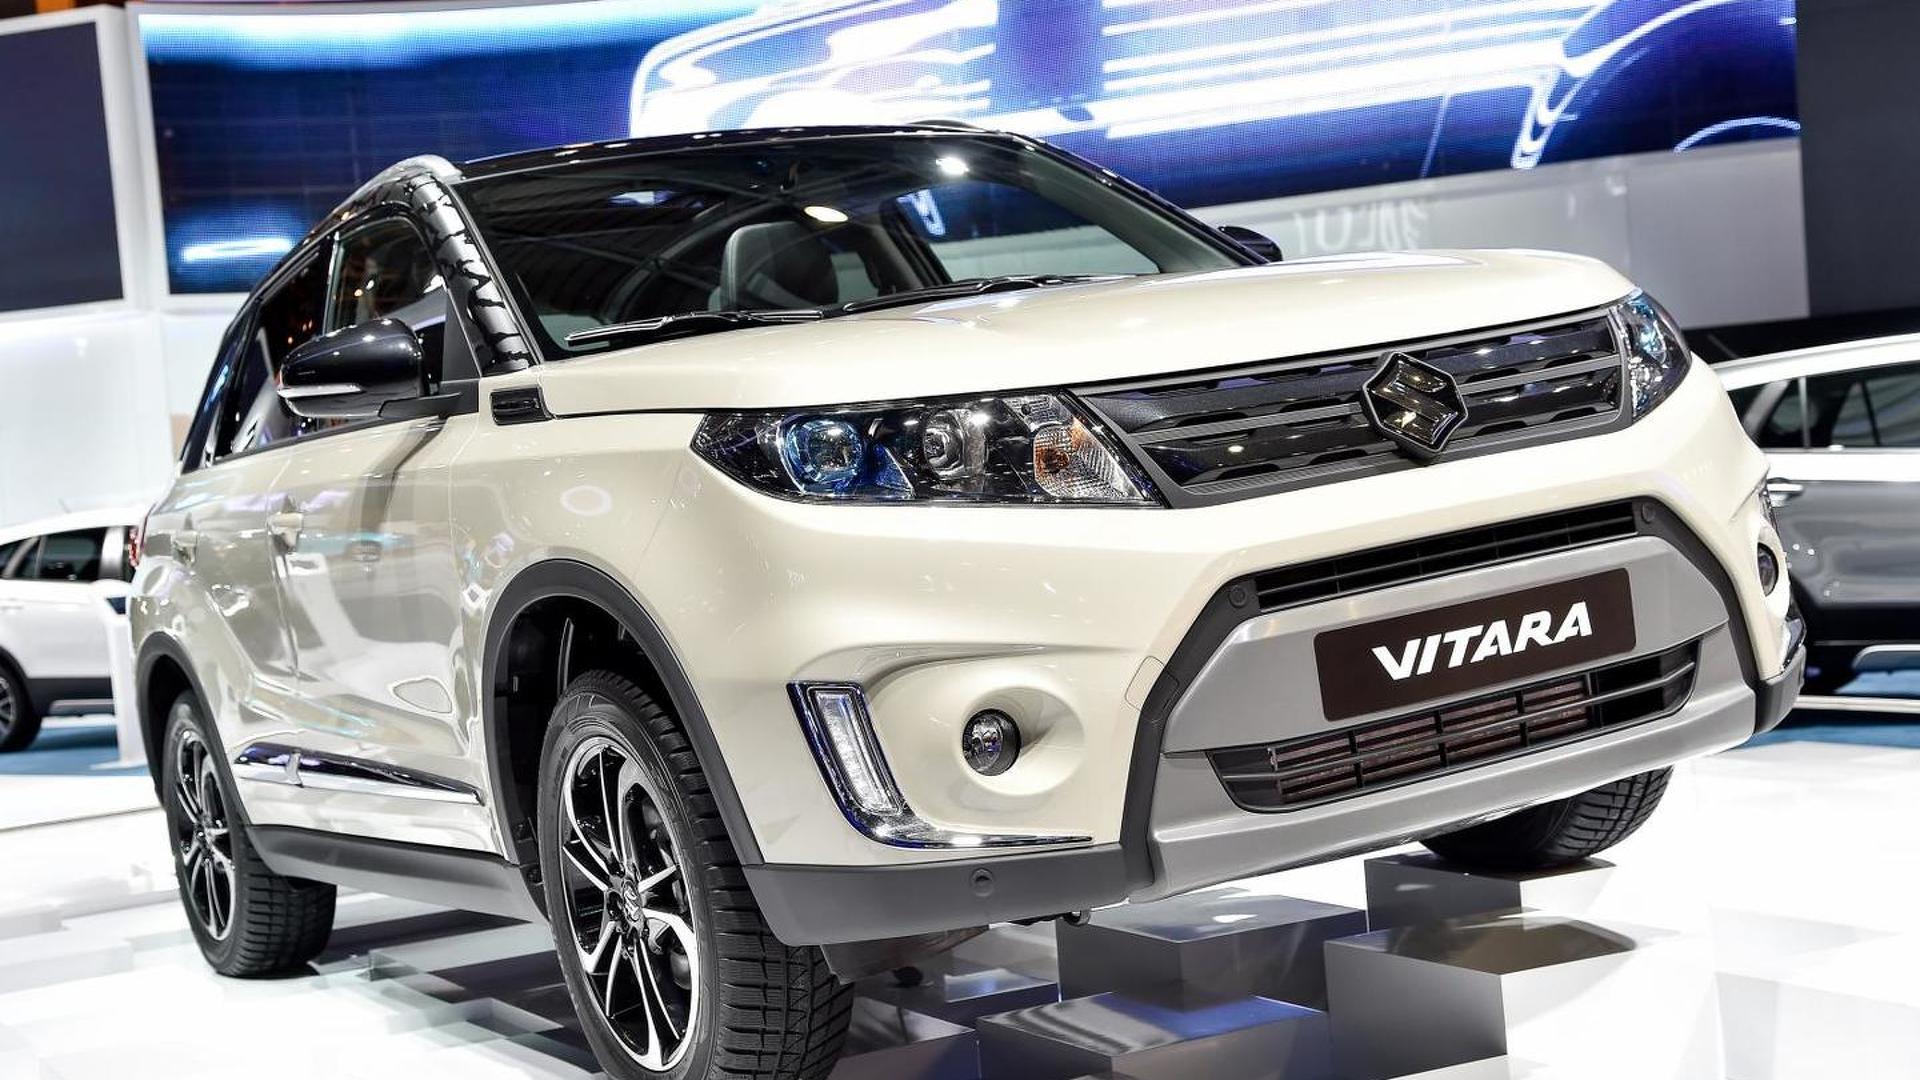 New Suzuki Vitara Shows Its Familiar Design In Paris